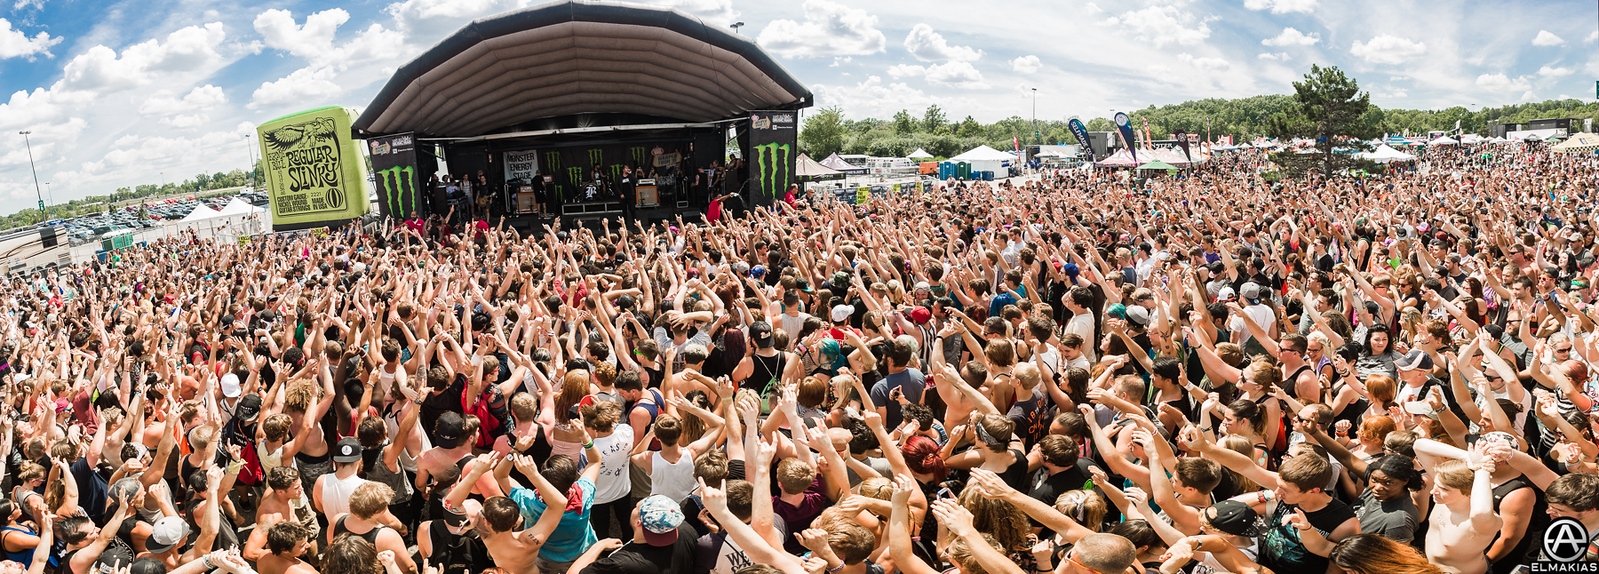 Beartooth live at Vans Warped Tour 2015 by Adam Elmakias